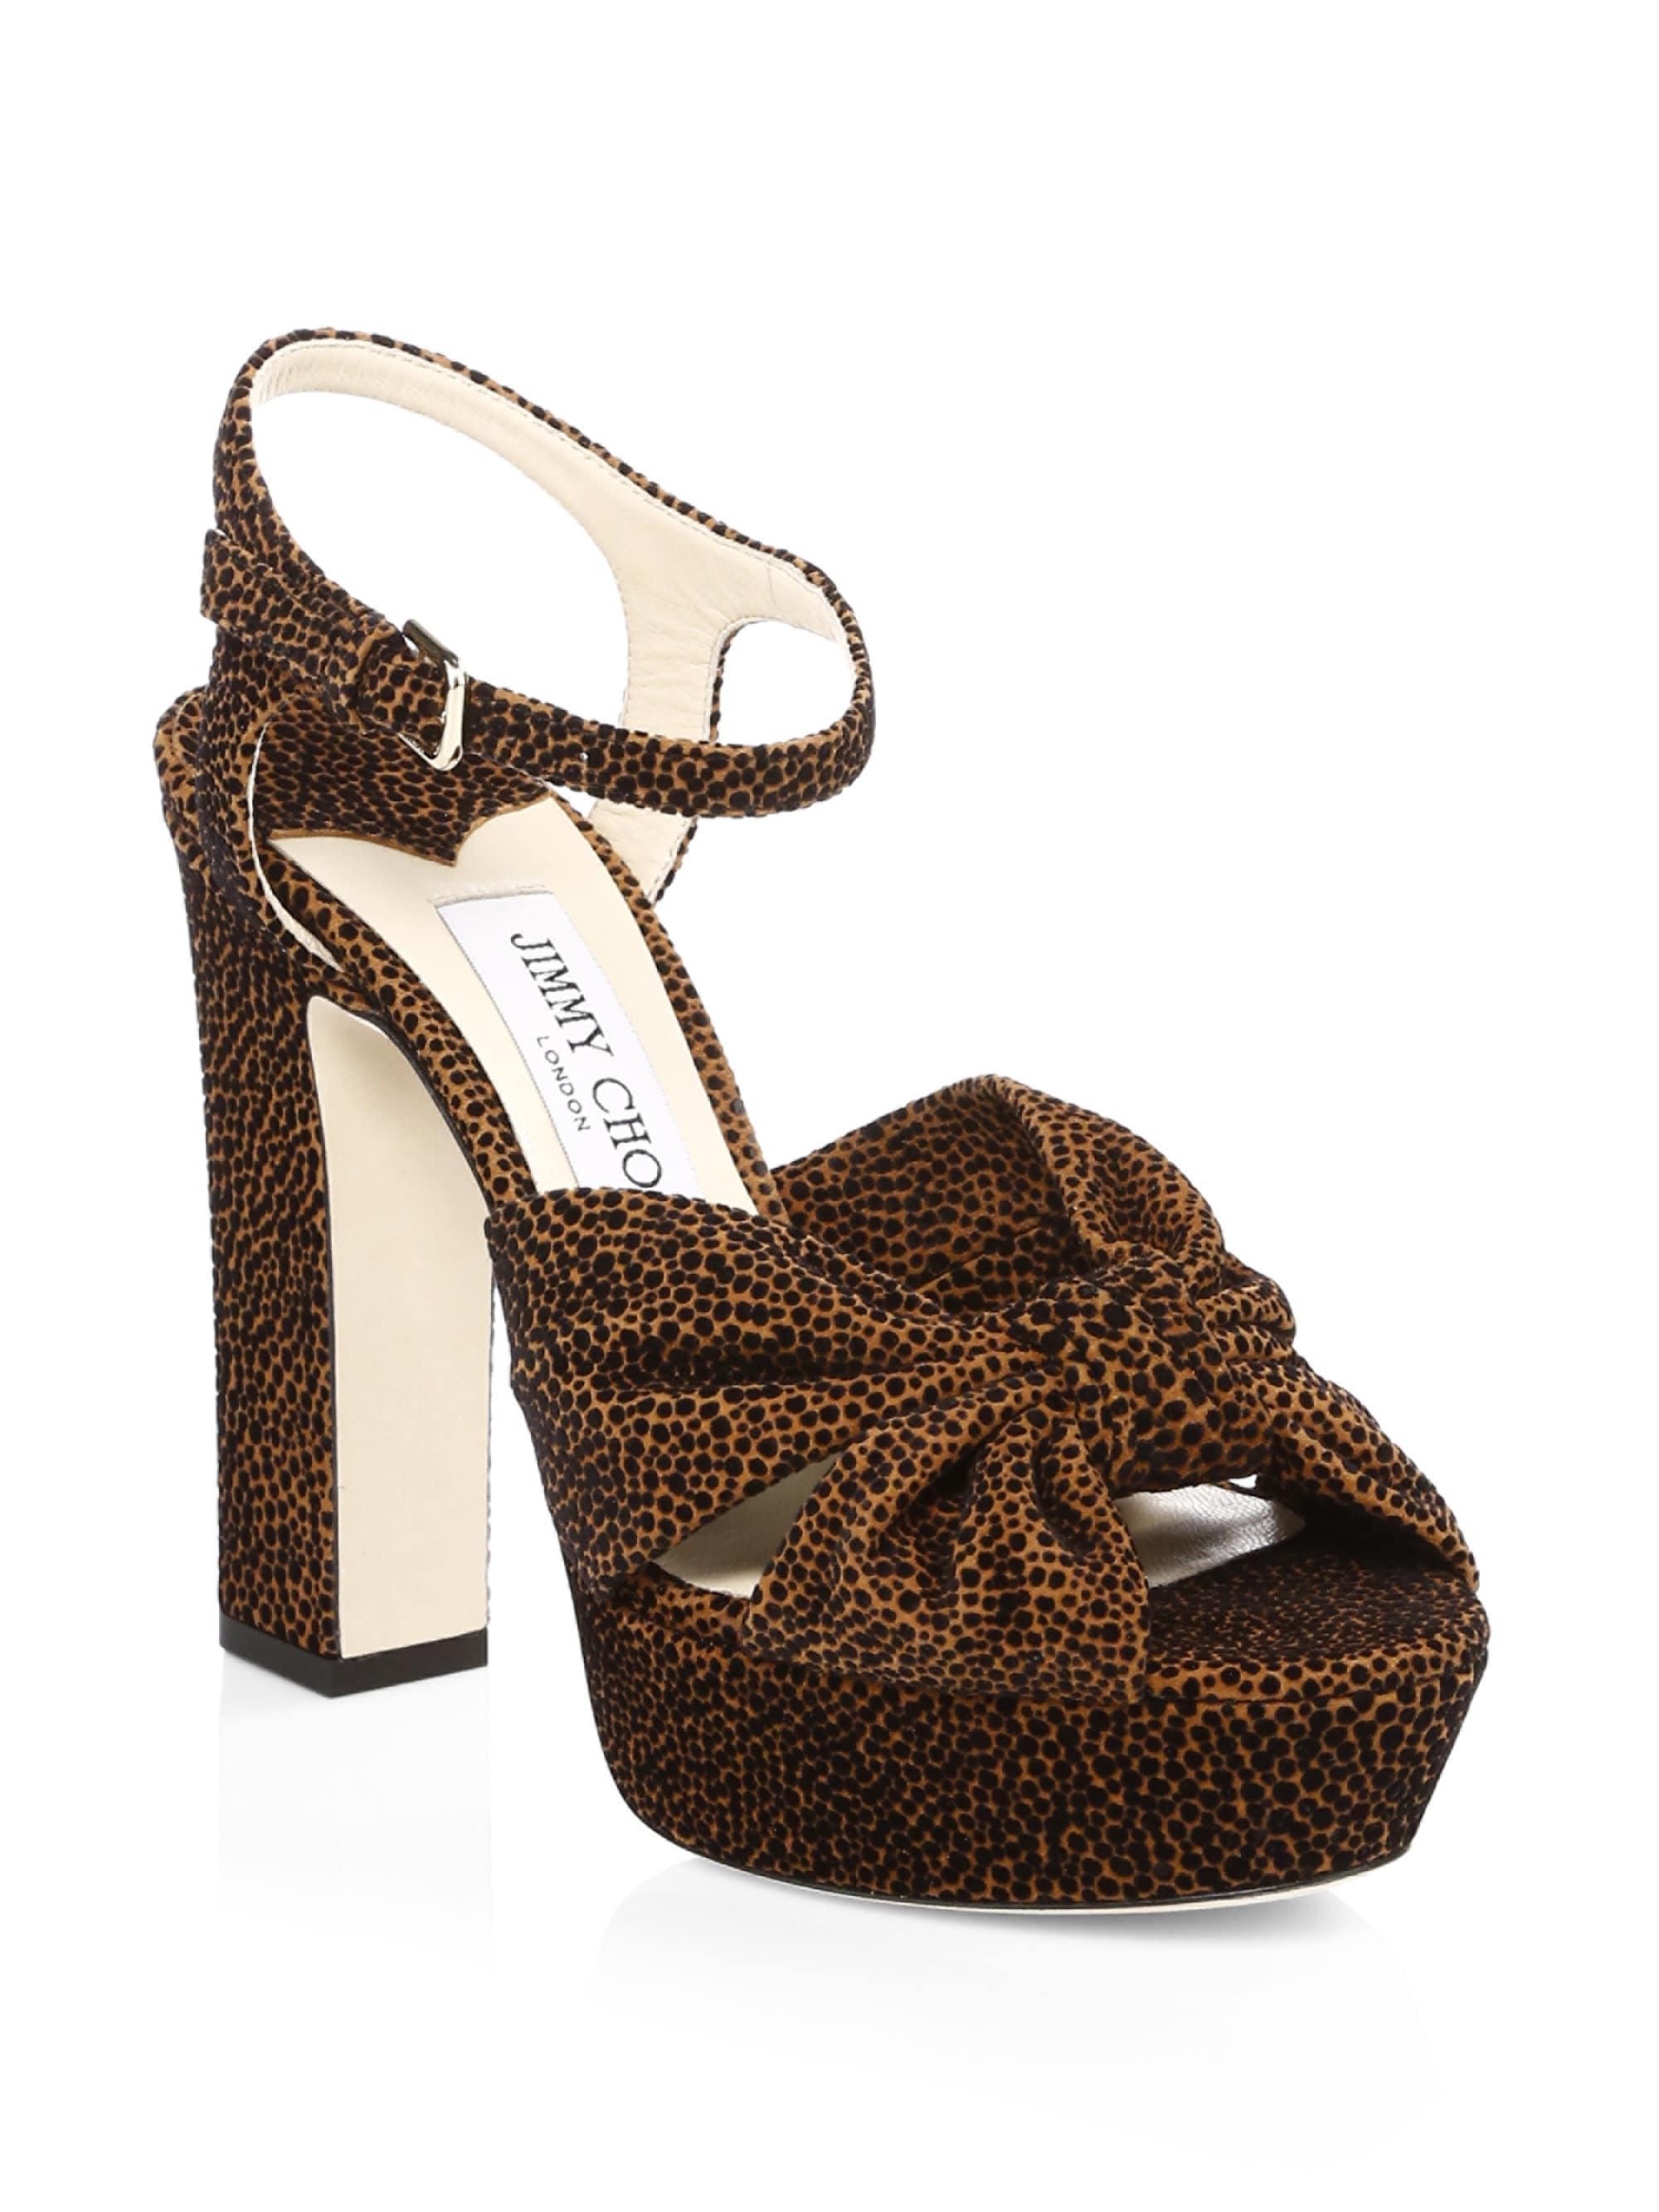 821ec6dc37c5 Jimmy Choo Heloise Leopard Print Platform Sandals in Brown - Lyst